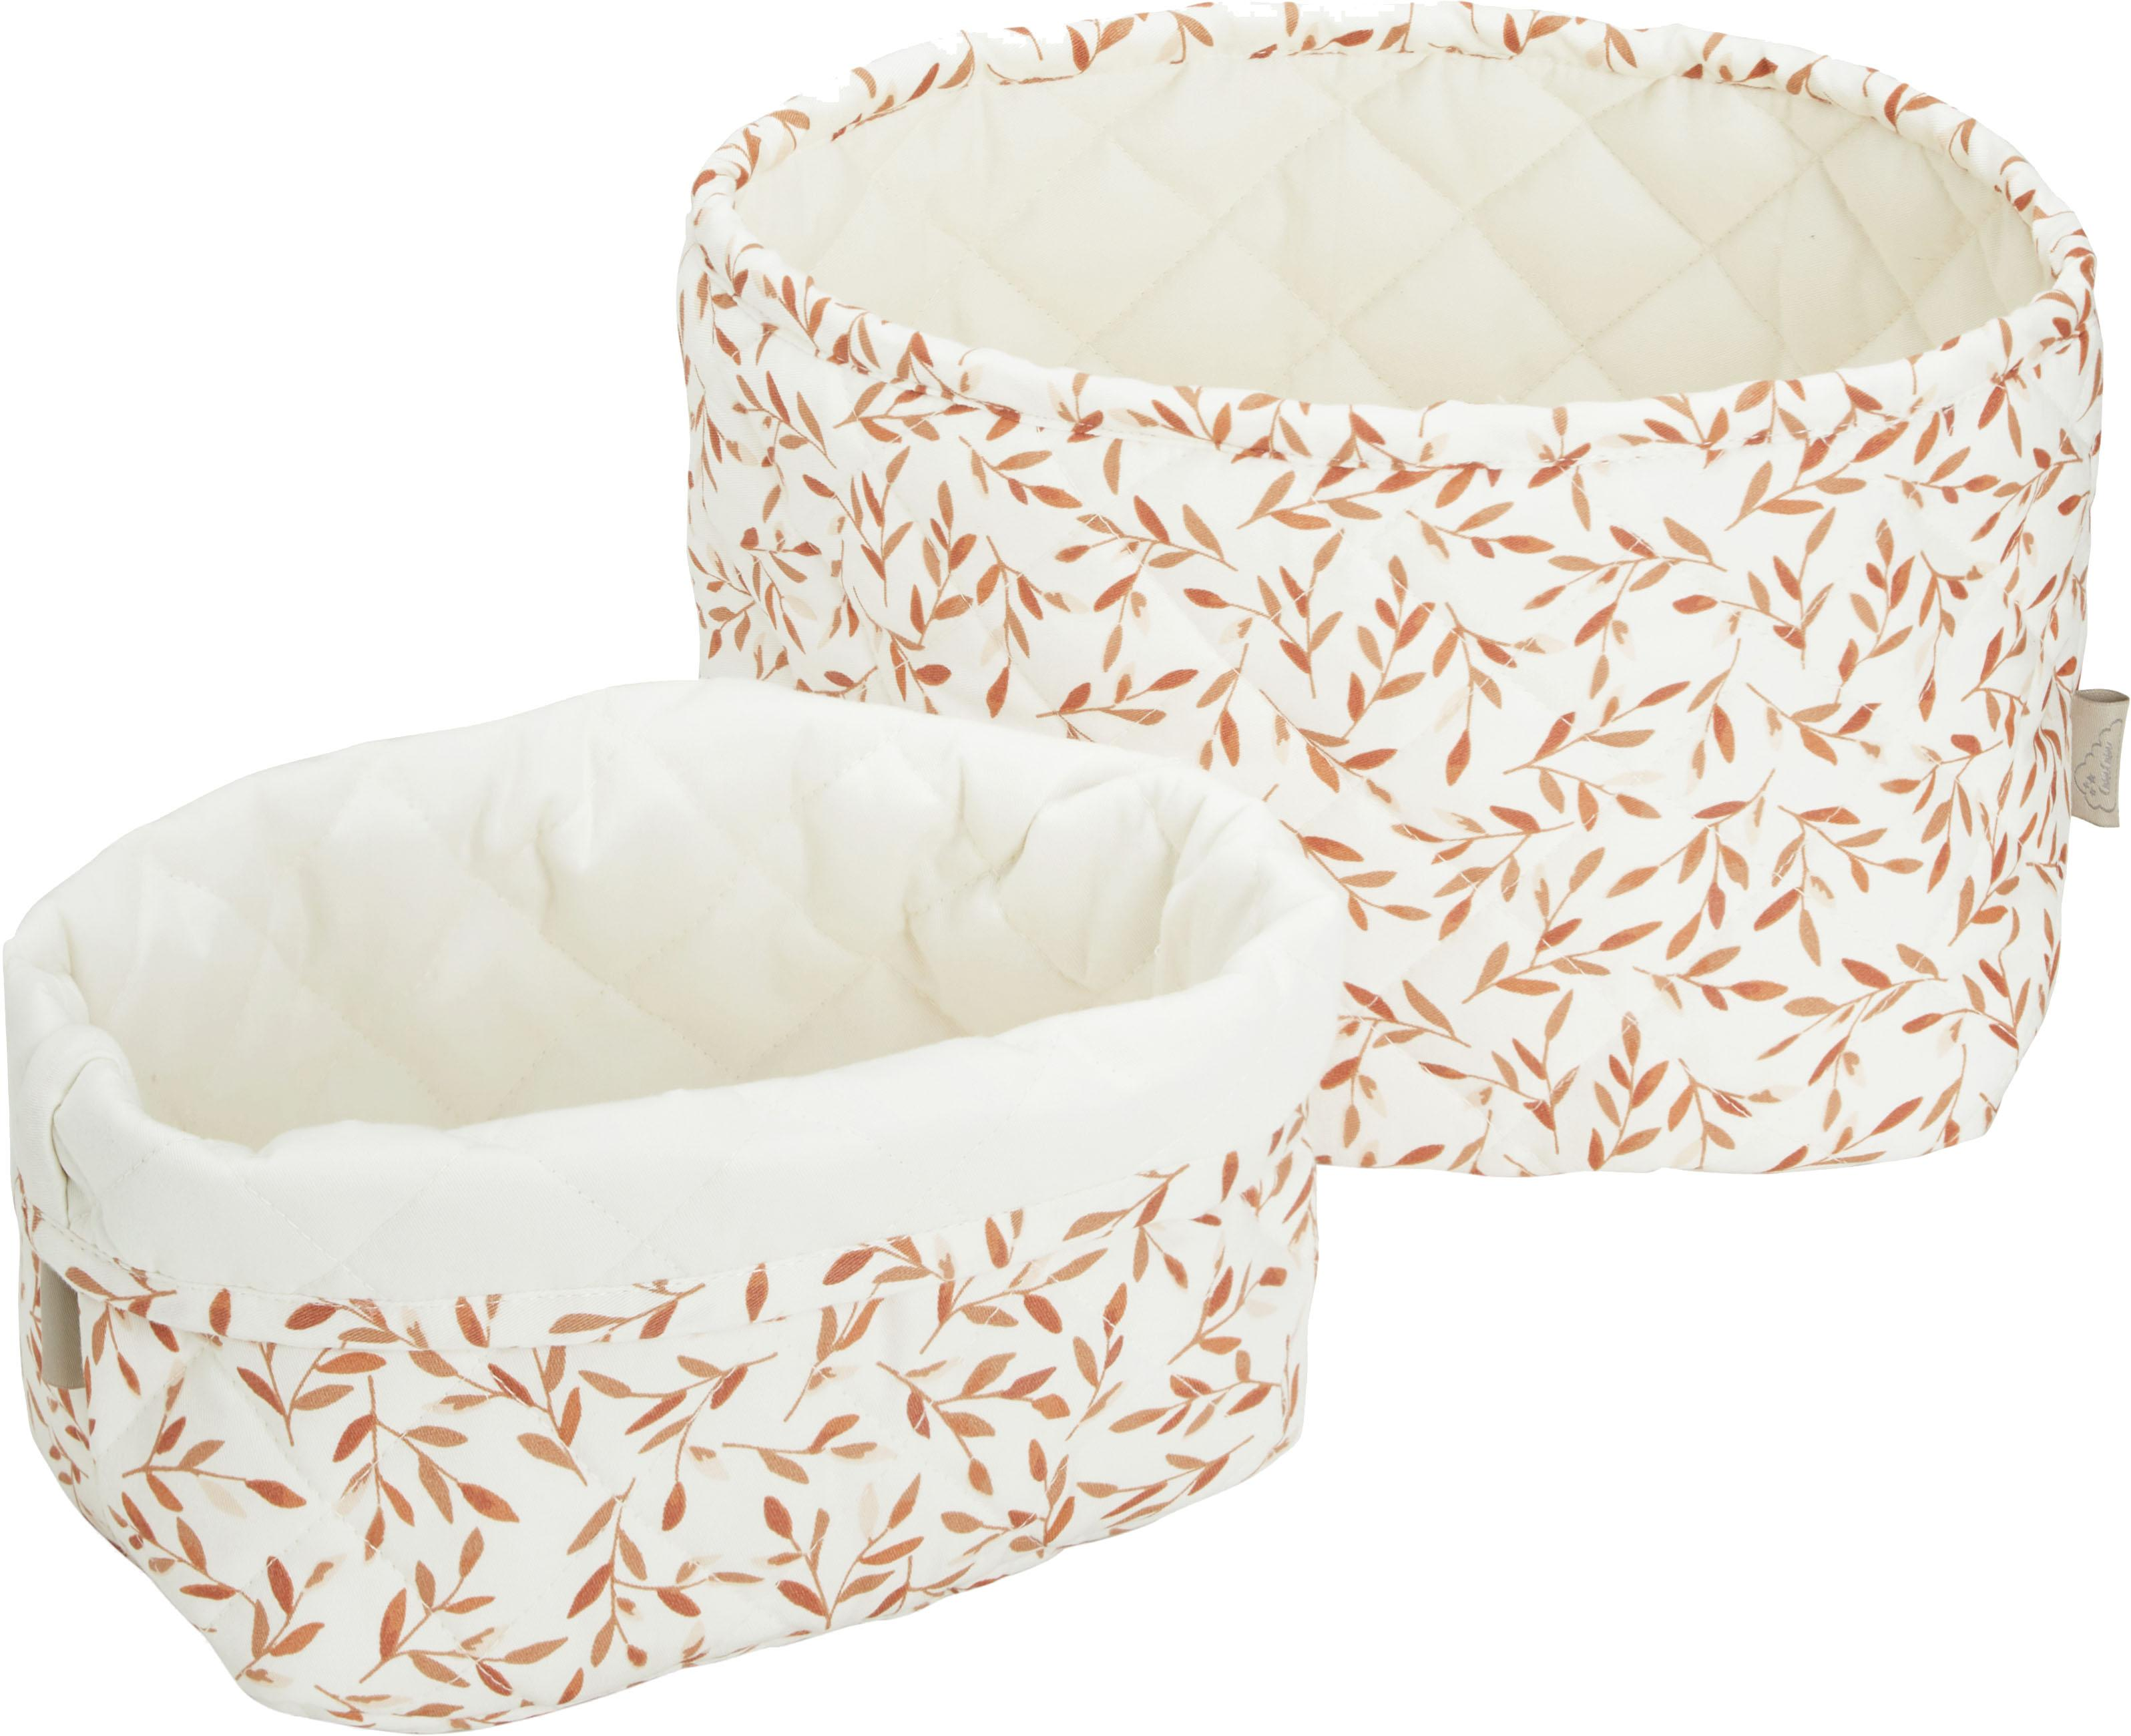 Set de cestas de algodón ecológico Leaves, 2pzas., Funda: 100%algodón ecológico, c, Crema, naranja, Set de diferentes tamaños